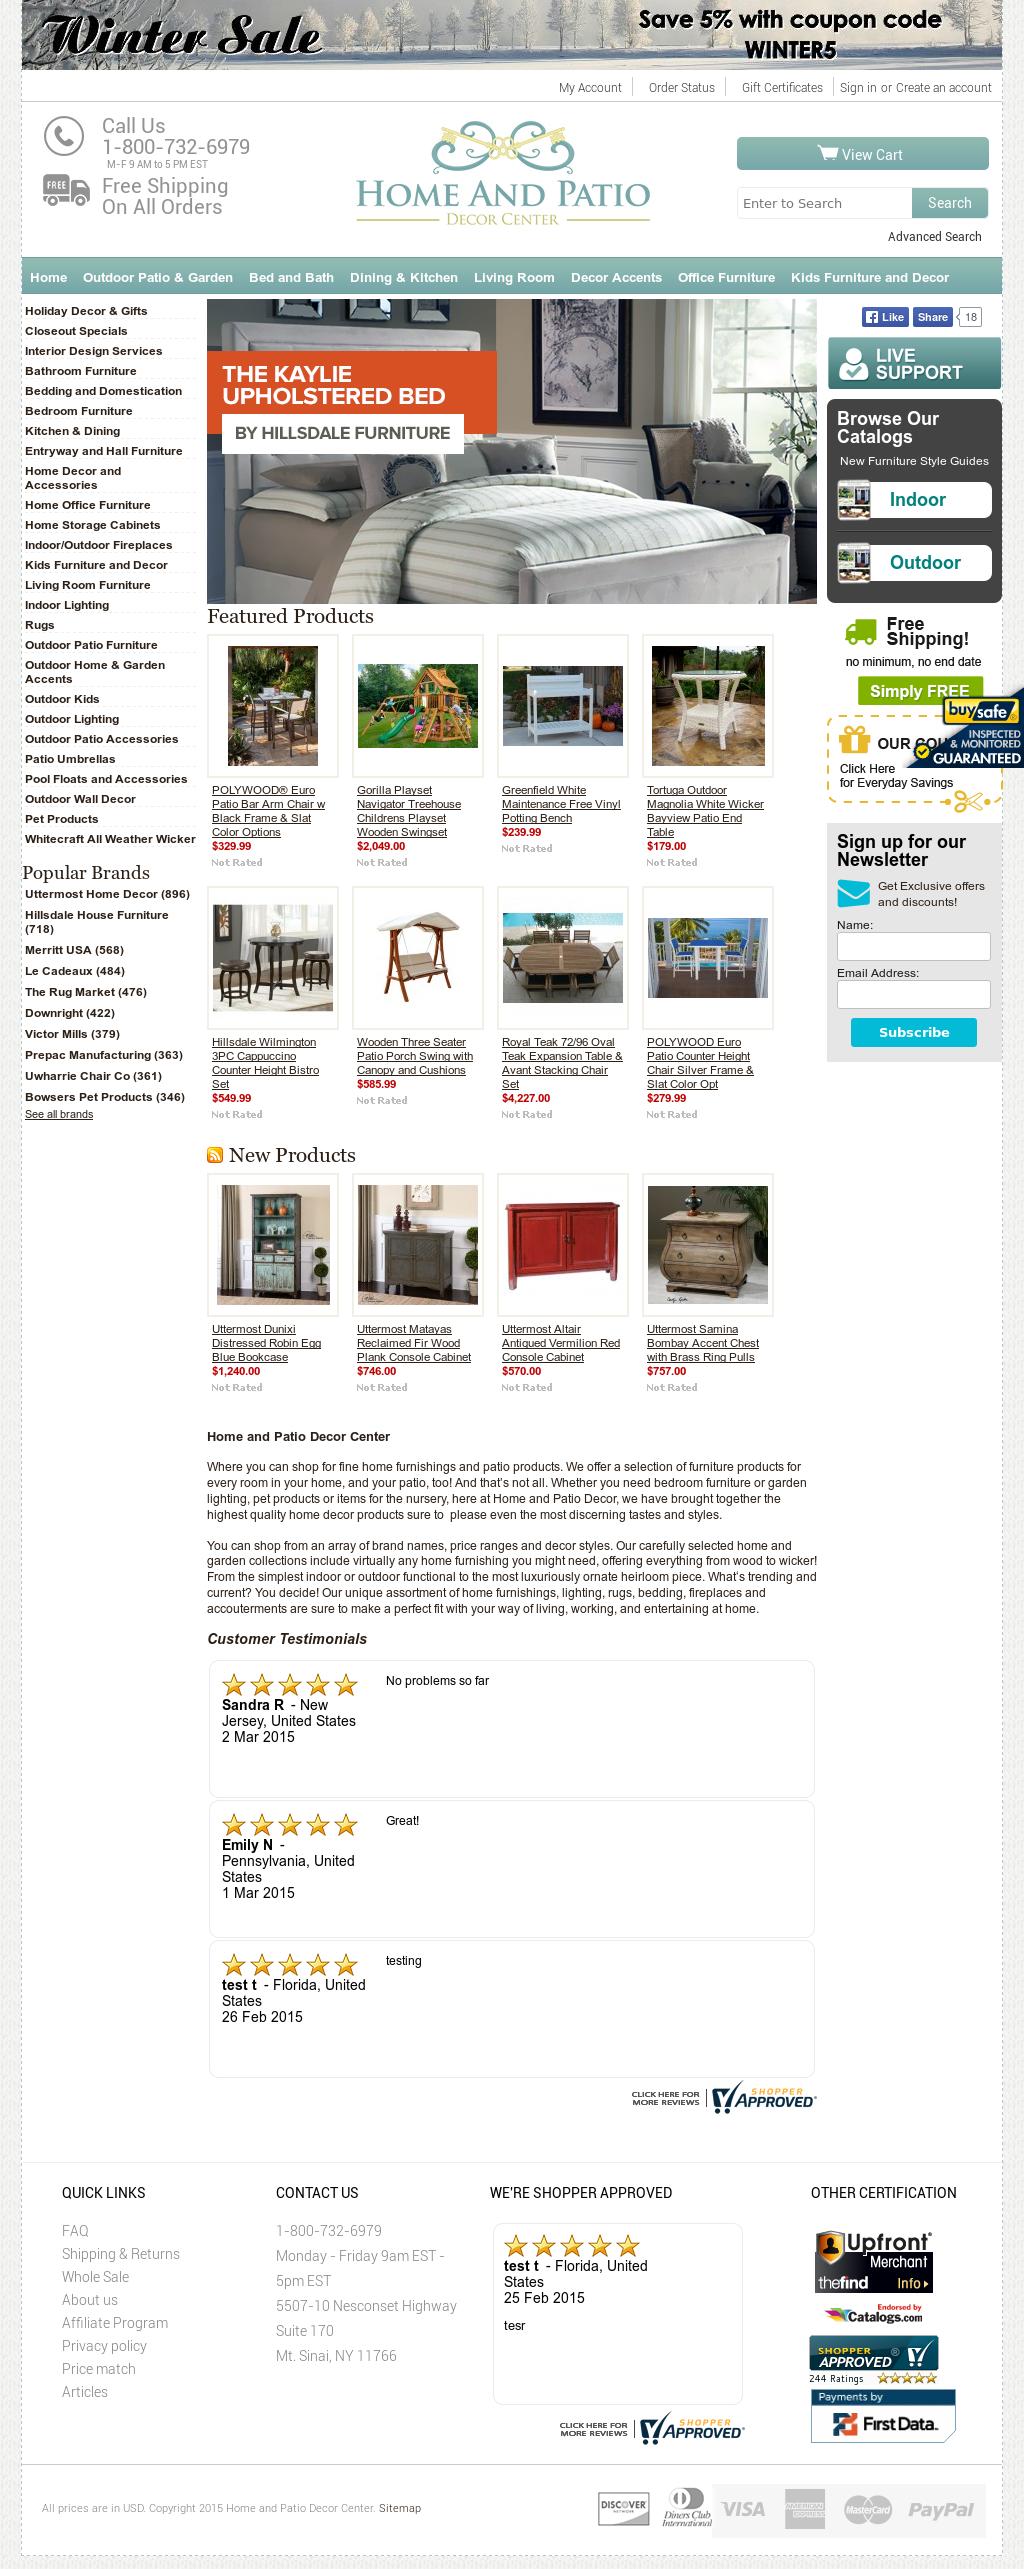 home and patio decor center competitors revenue and employees rh owler com Patio Furniture and Decor Garden and Patio Decor